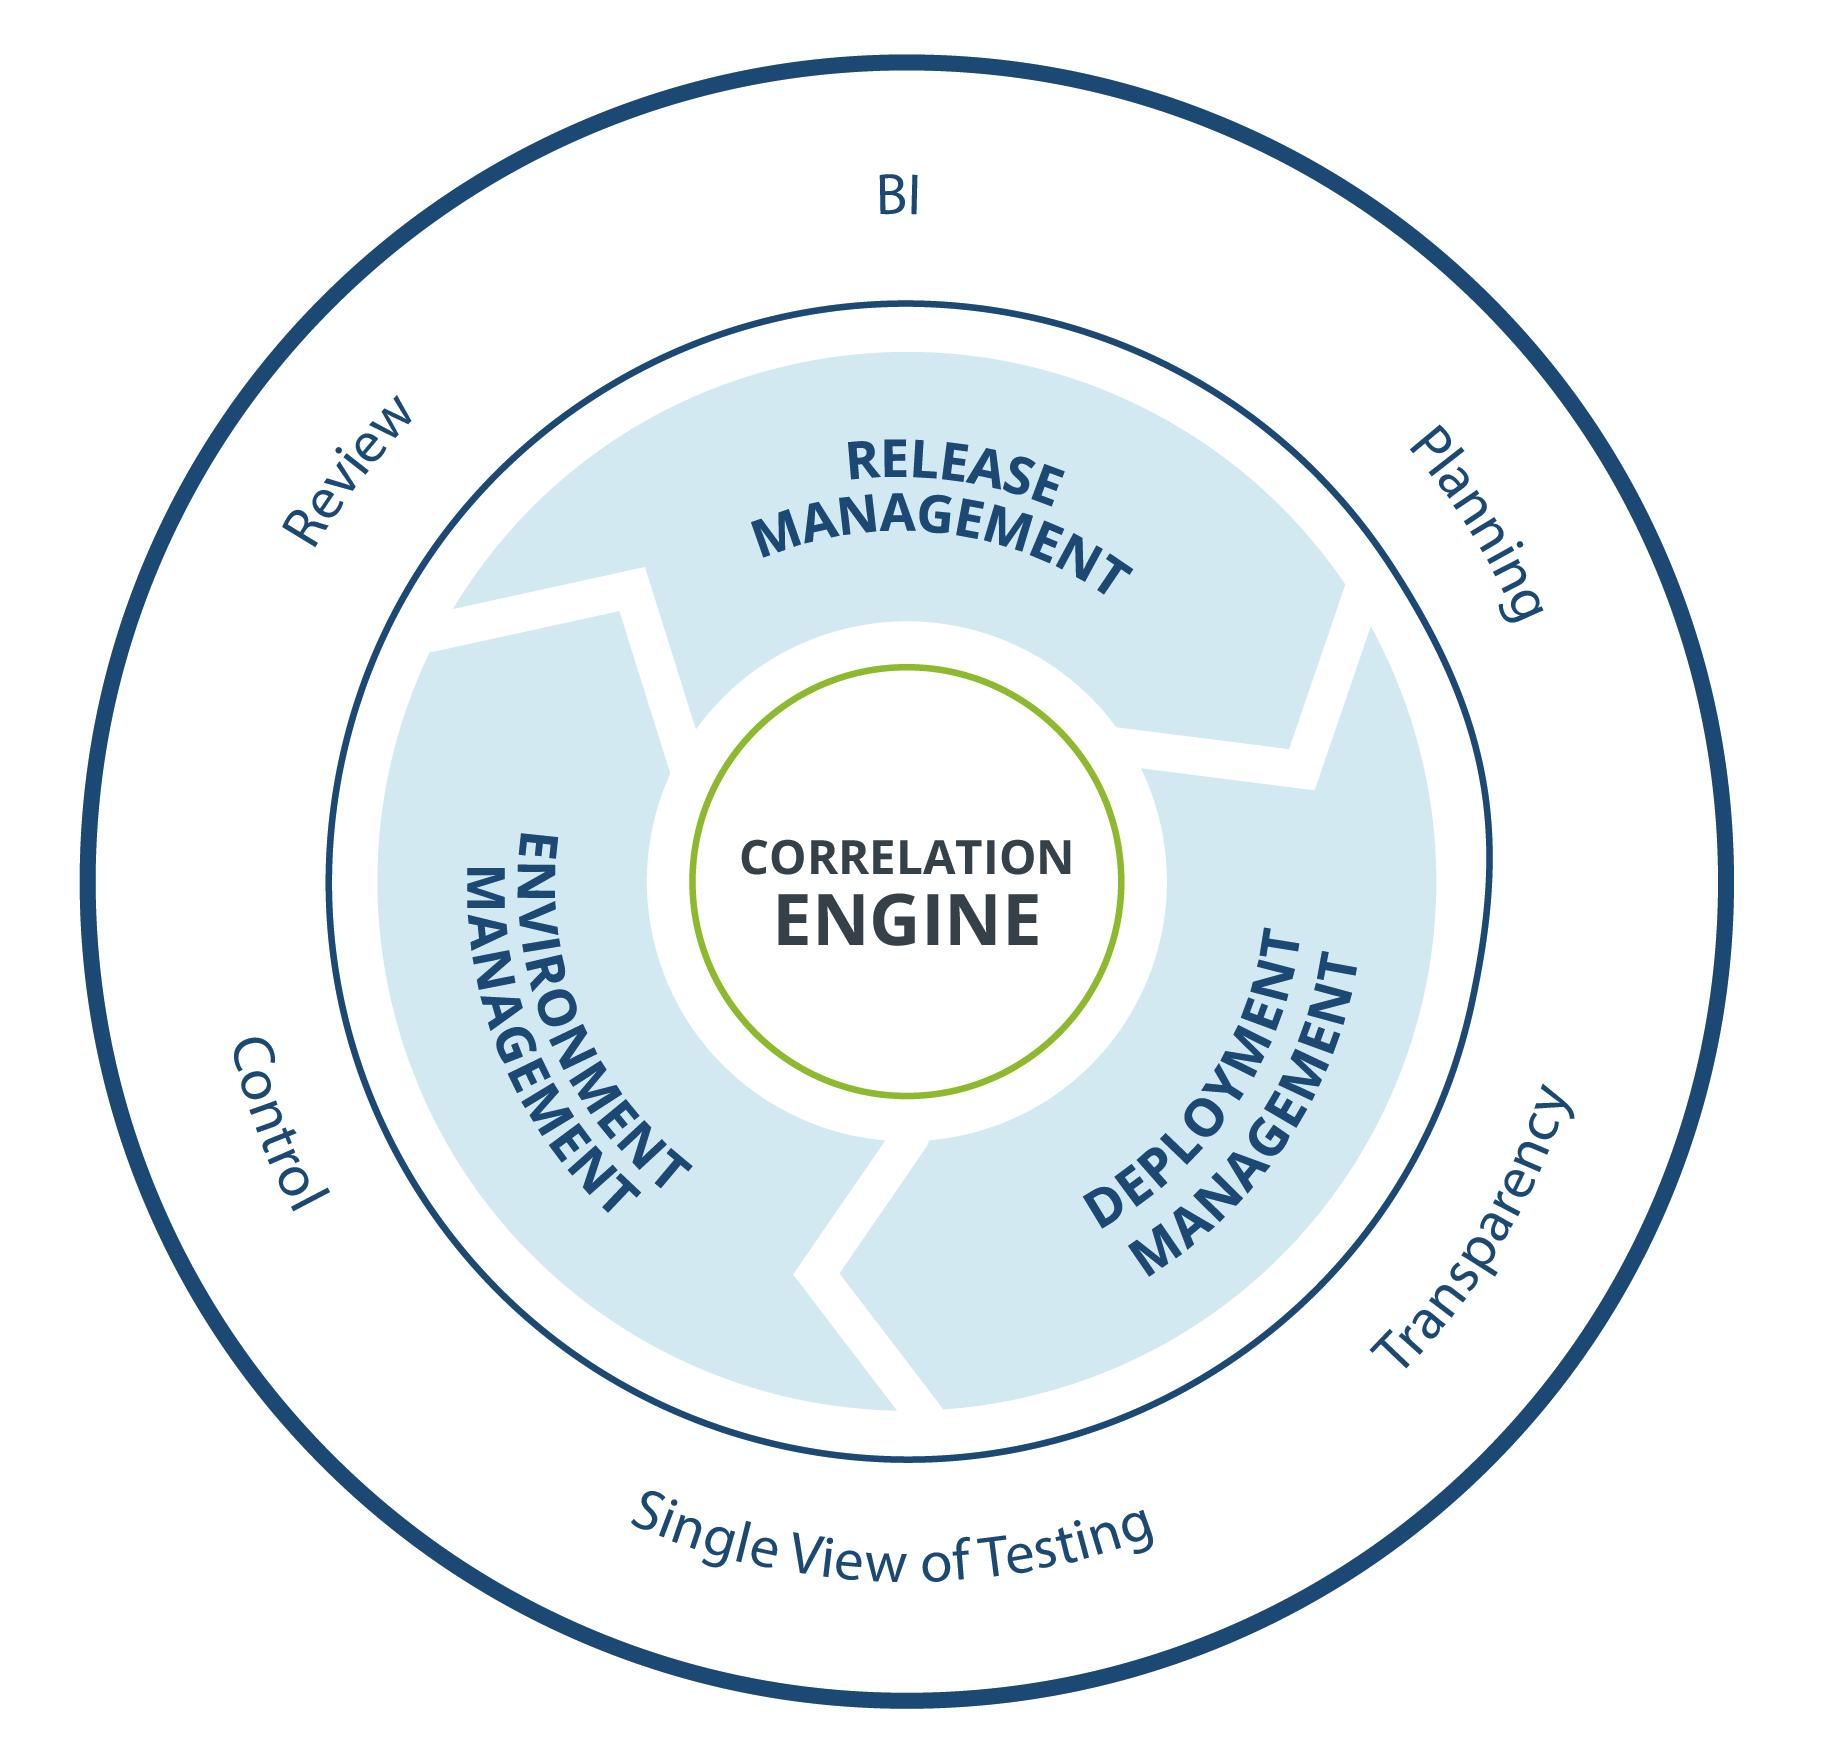 Plutora-Diagrams-2016_Correlation_Engine-No-Logo.png